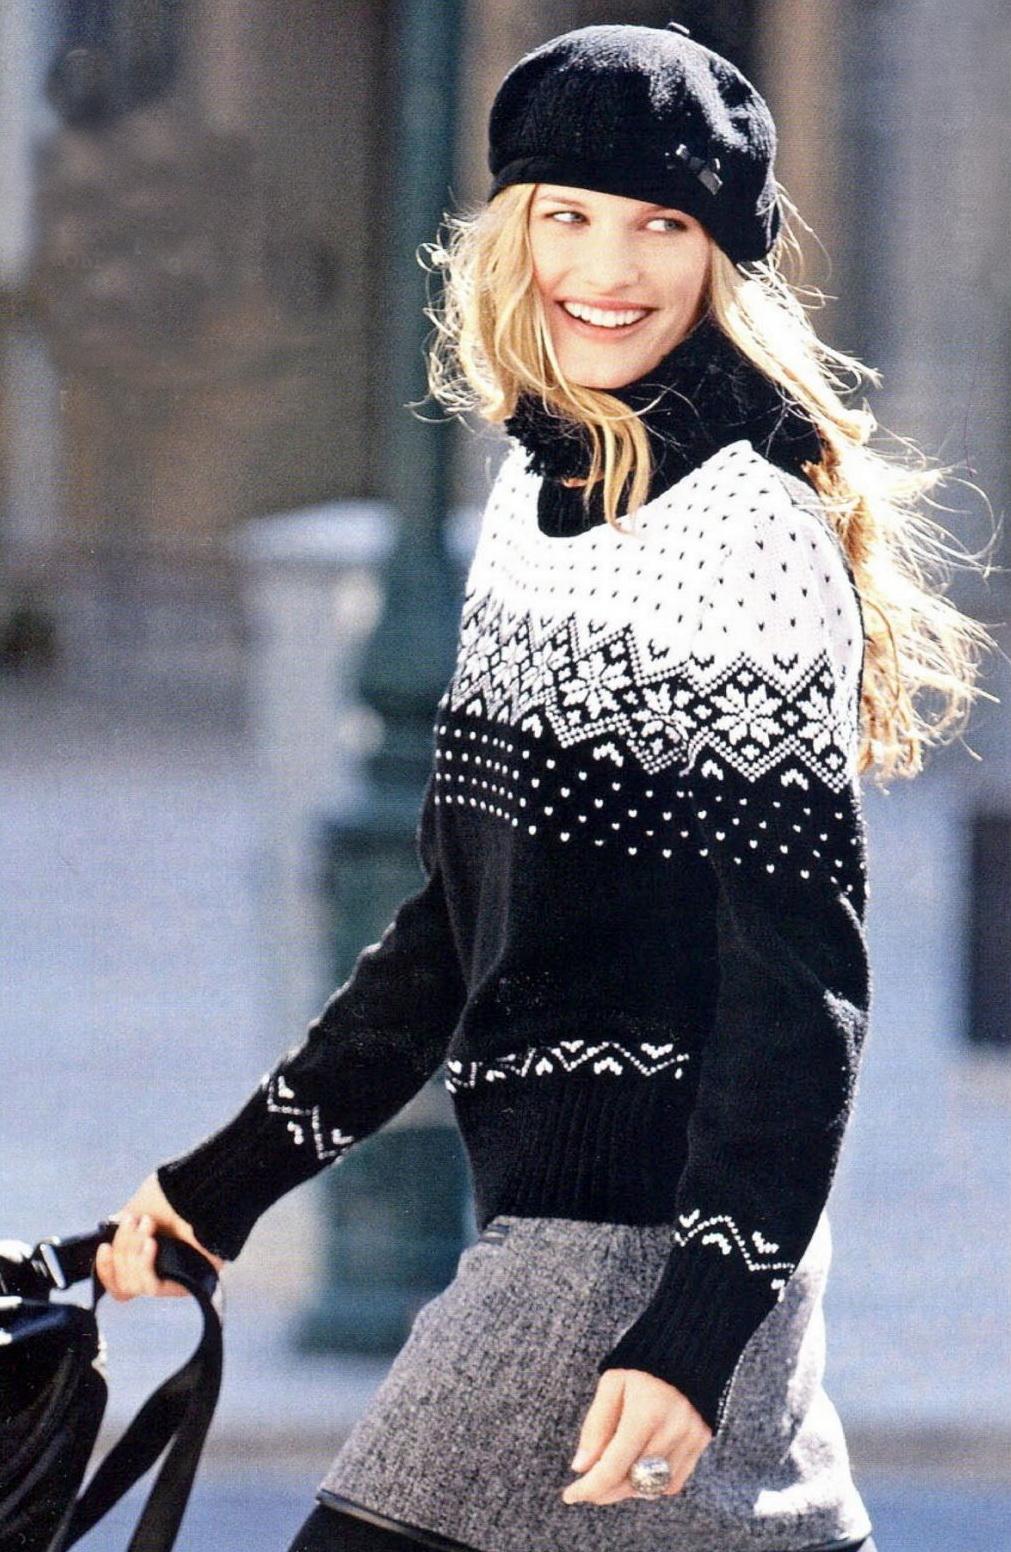 свитер со звездой схема на спицах